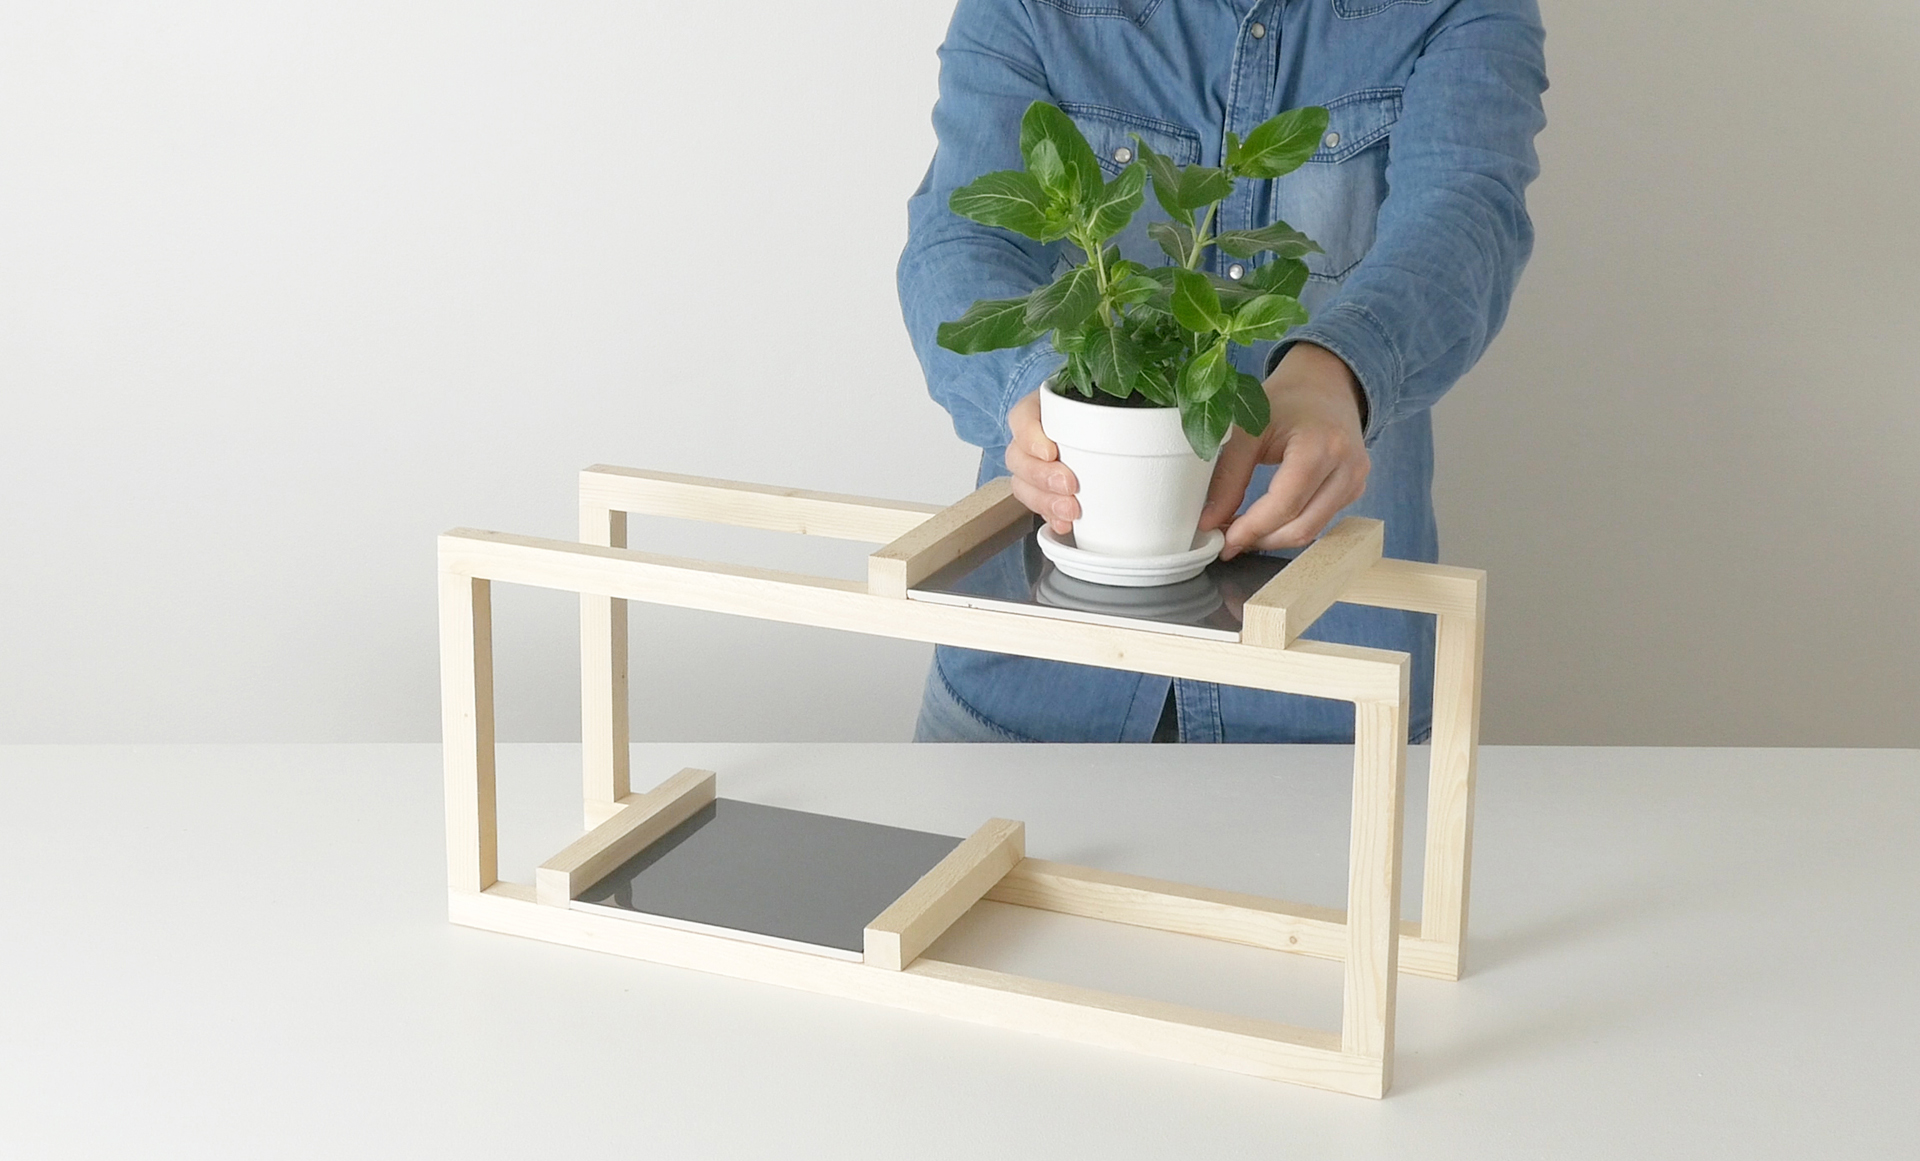 pierrelota_meuble_plantes_1_image8